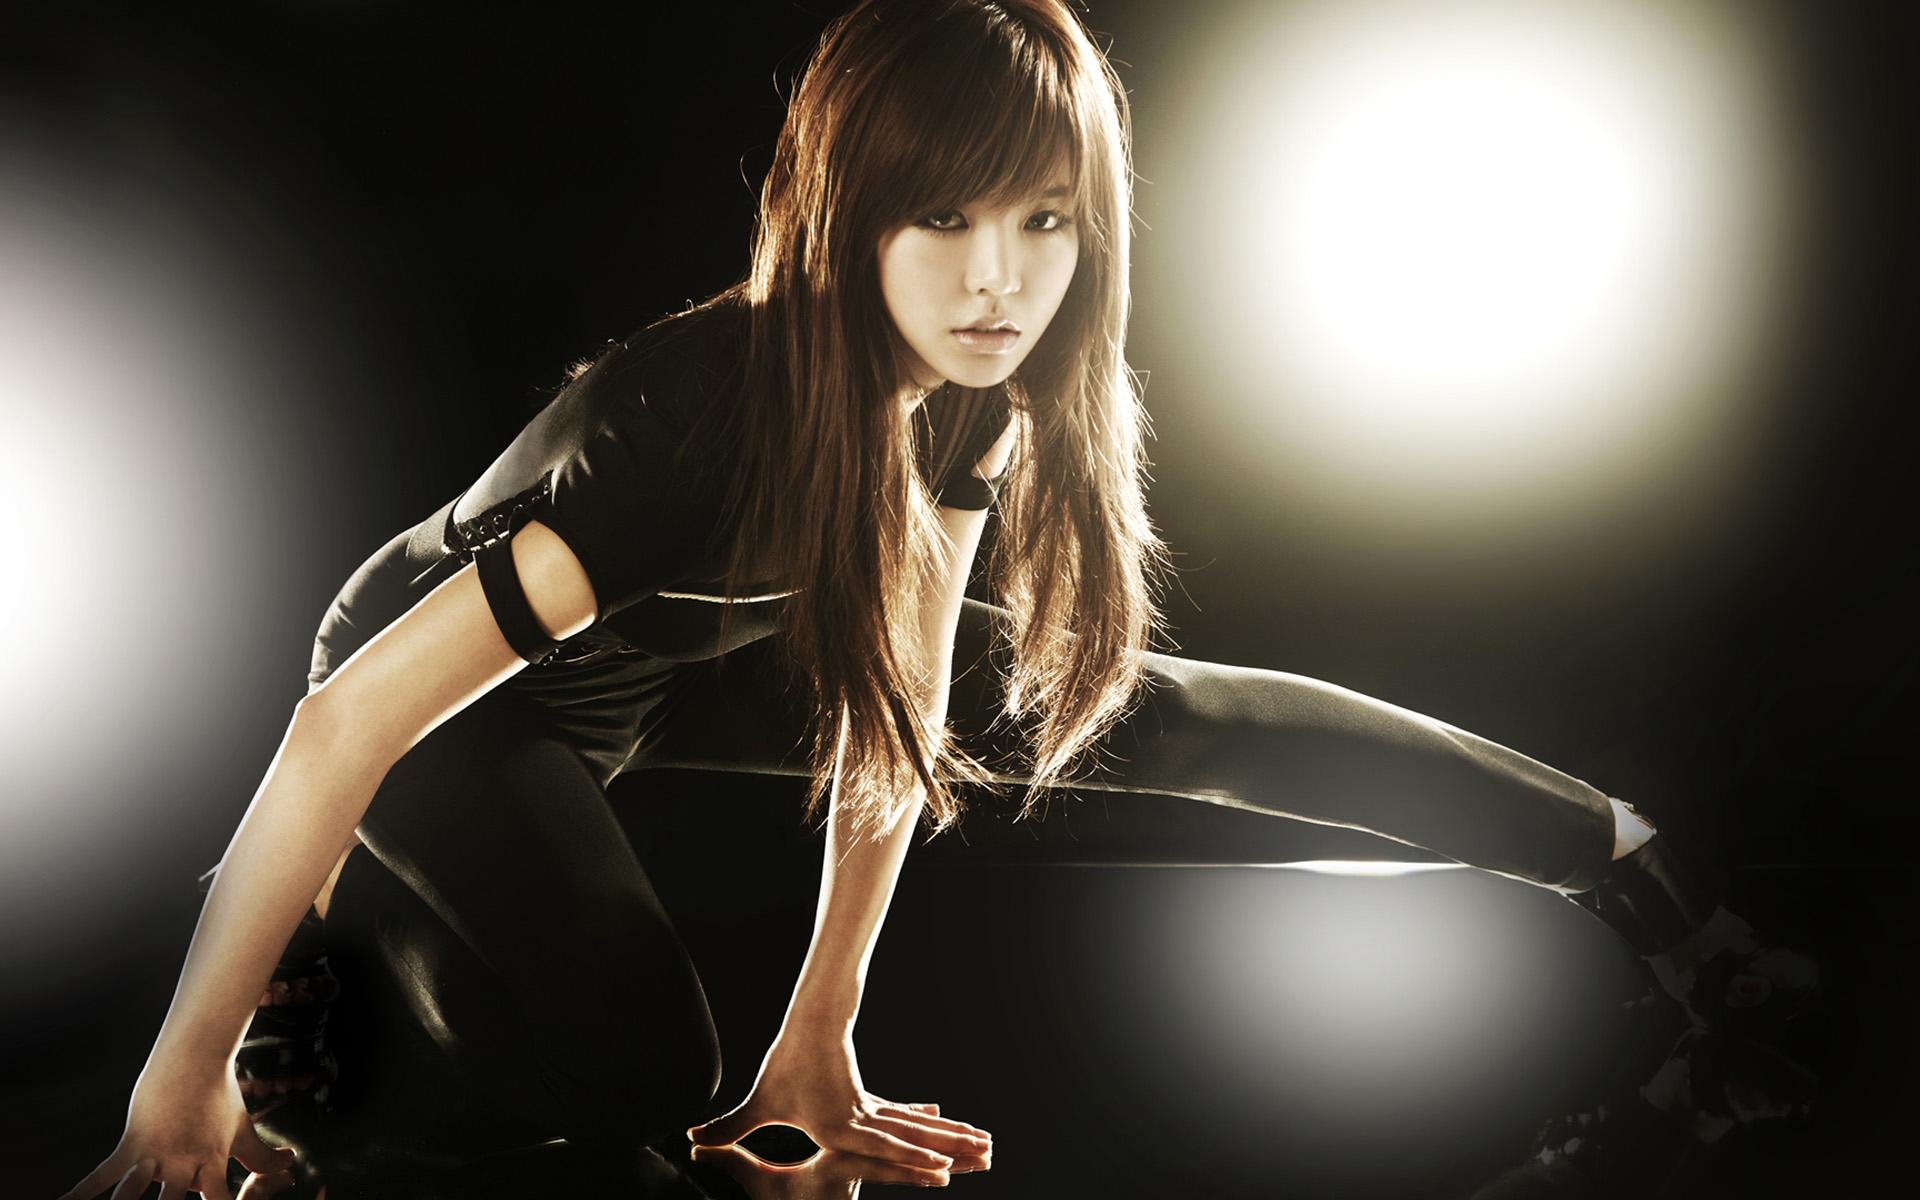 Jessica Jung Iphone Wallpaper Dark Sunny Hd Wallpaper Background Image 1920x1200